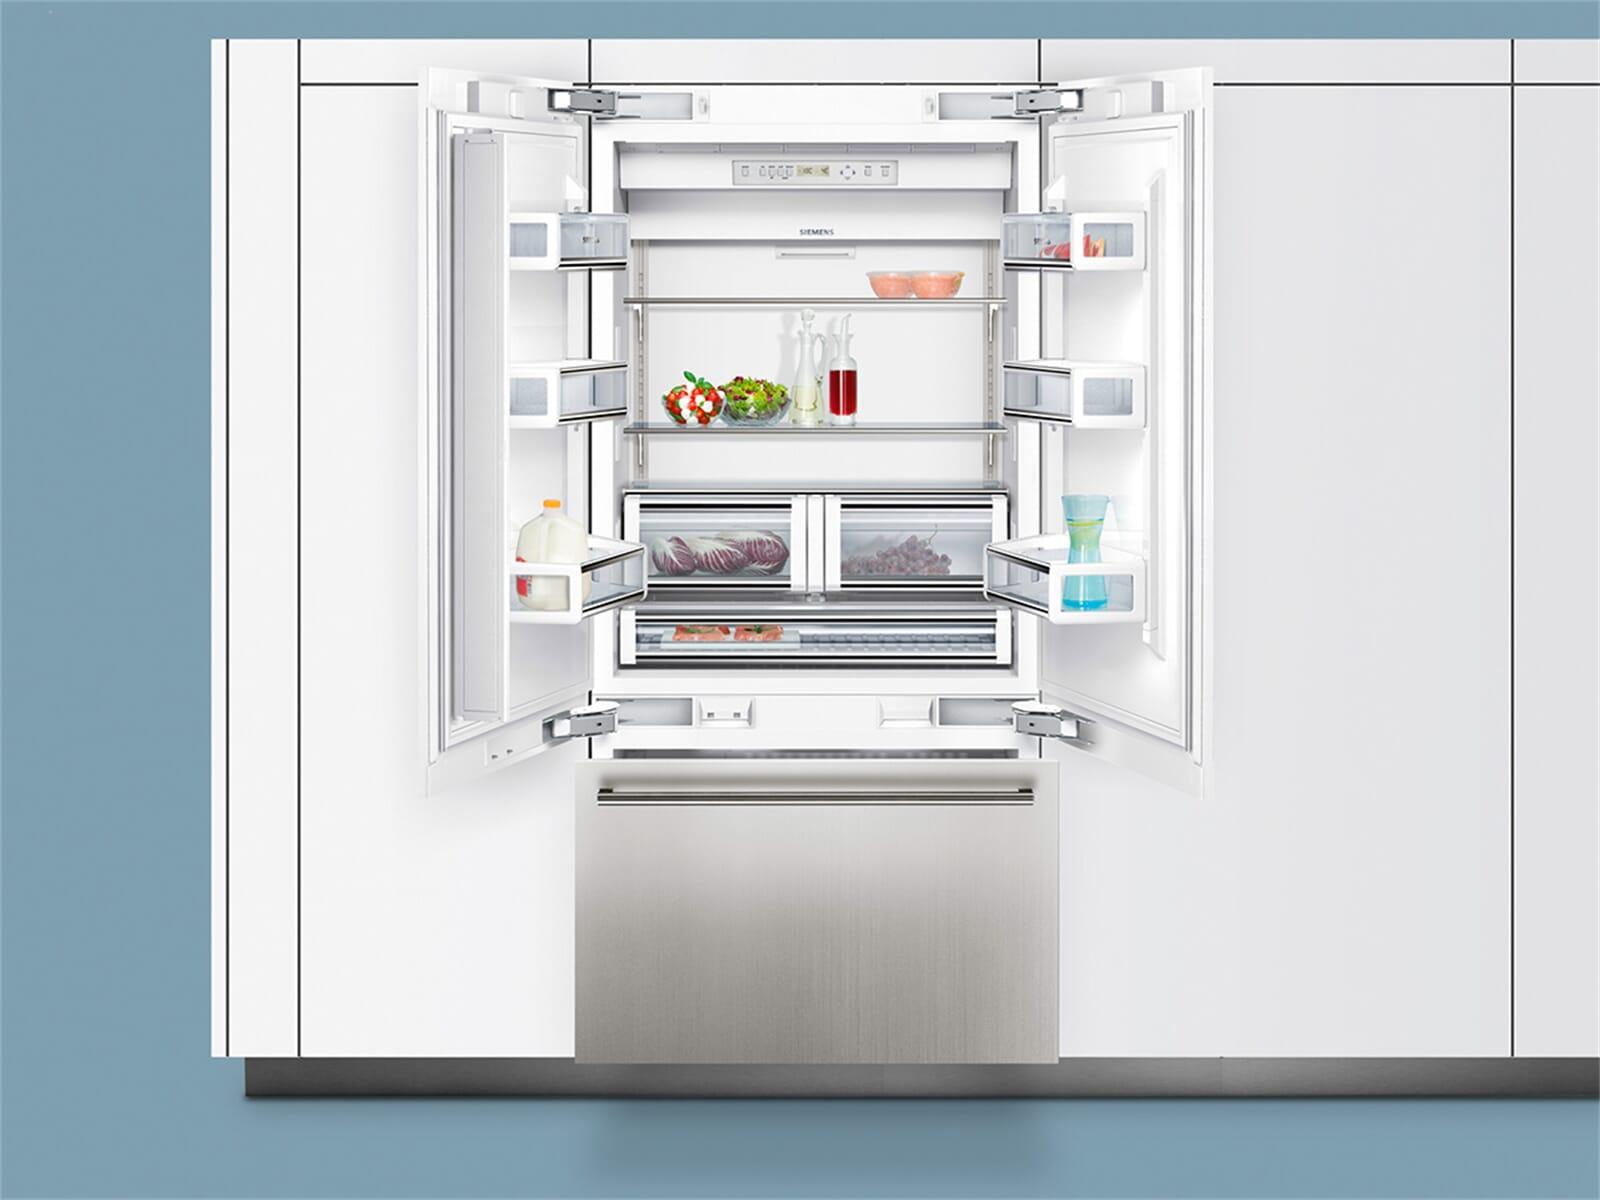 Amica Kühlschrank French Door : Kühlschrank french door liebherr kühlschrank eiswürfelbereiter